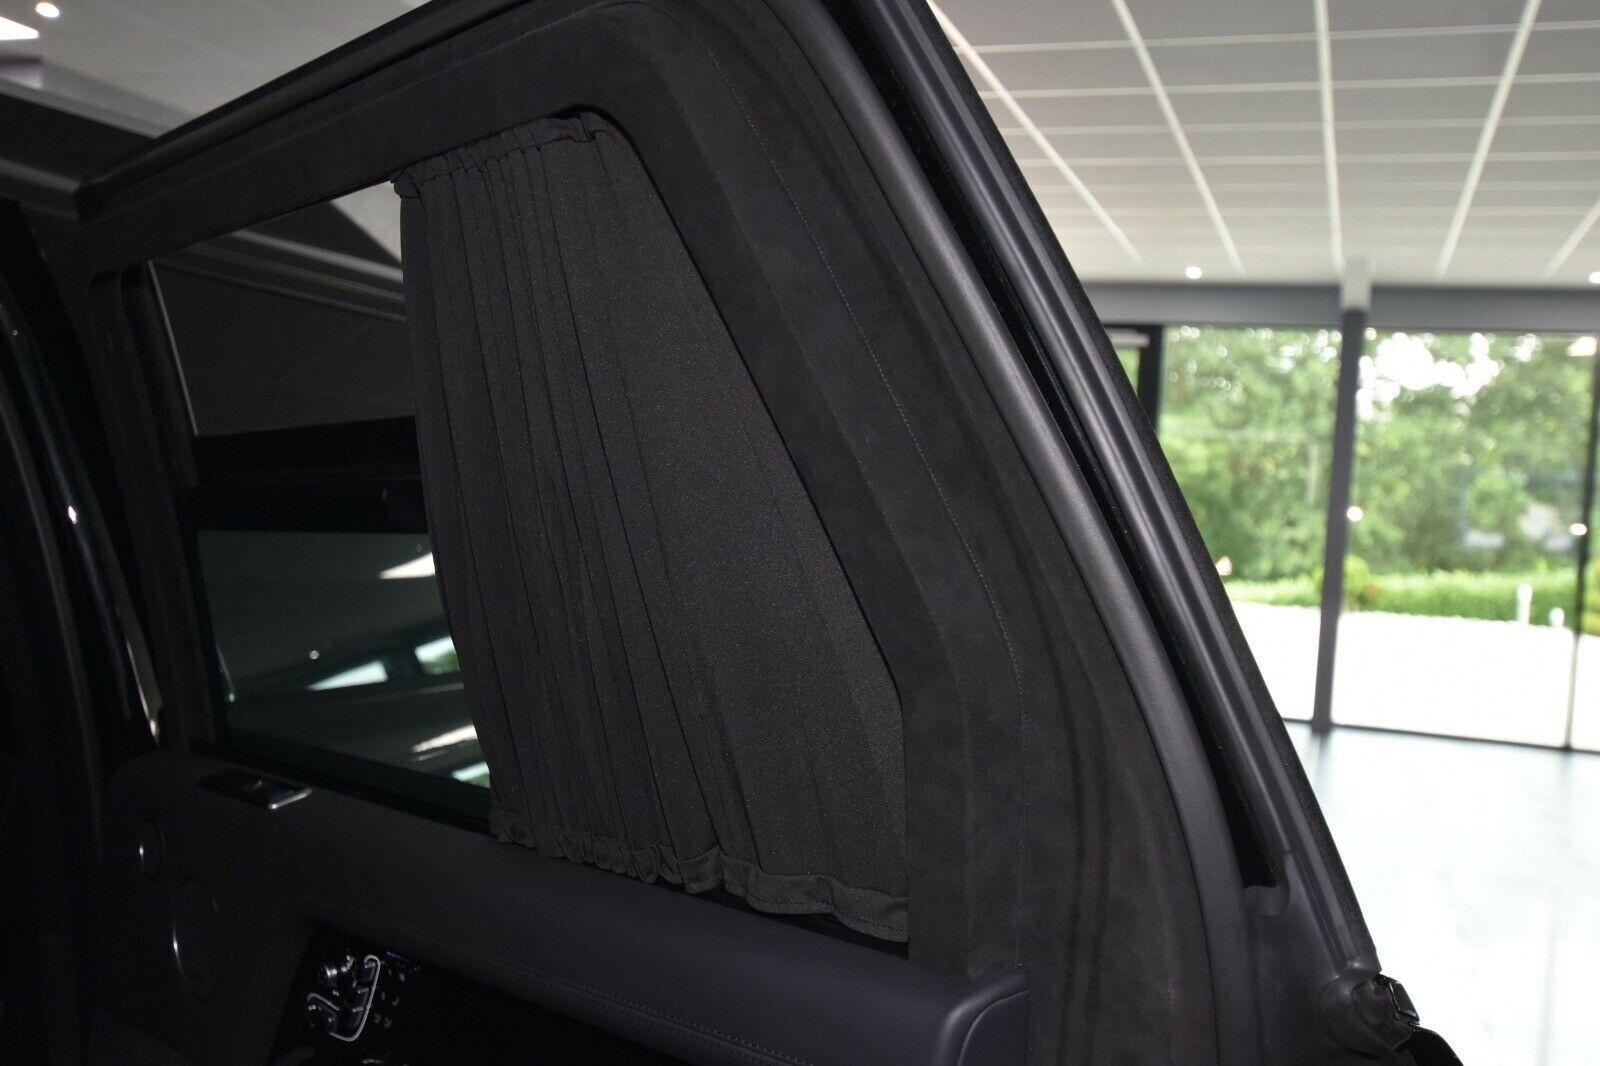 Range-Rover-SVAutobiography-by-Klassen-30